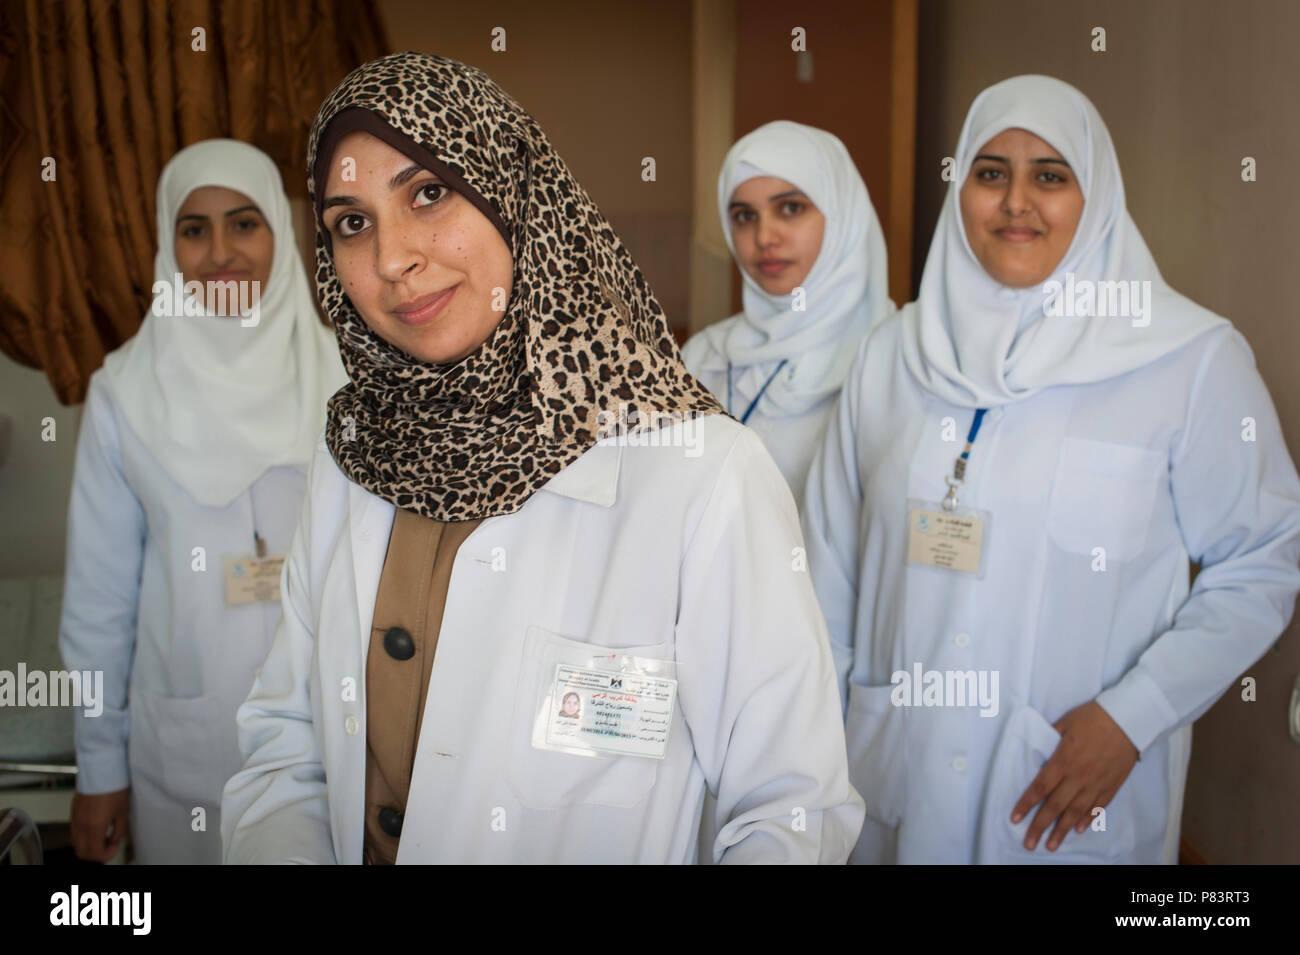 Working women in Islam Dr Yasmine Rabah Al Shorafa accompanied by nursing staff from the al Shifa Hospital, Gaza City. - Stock Image